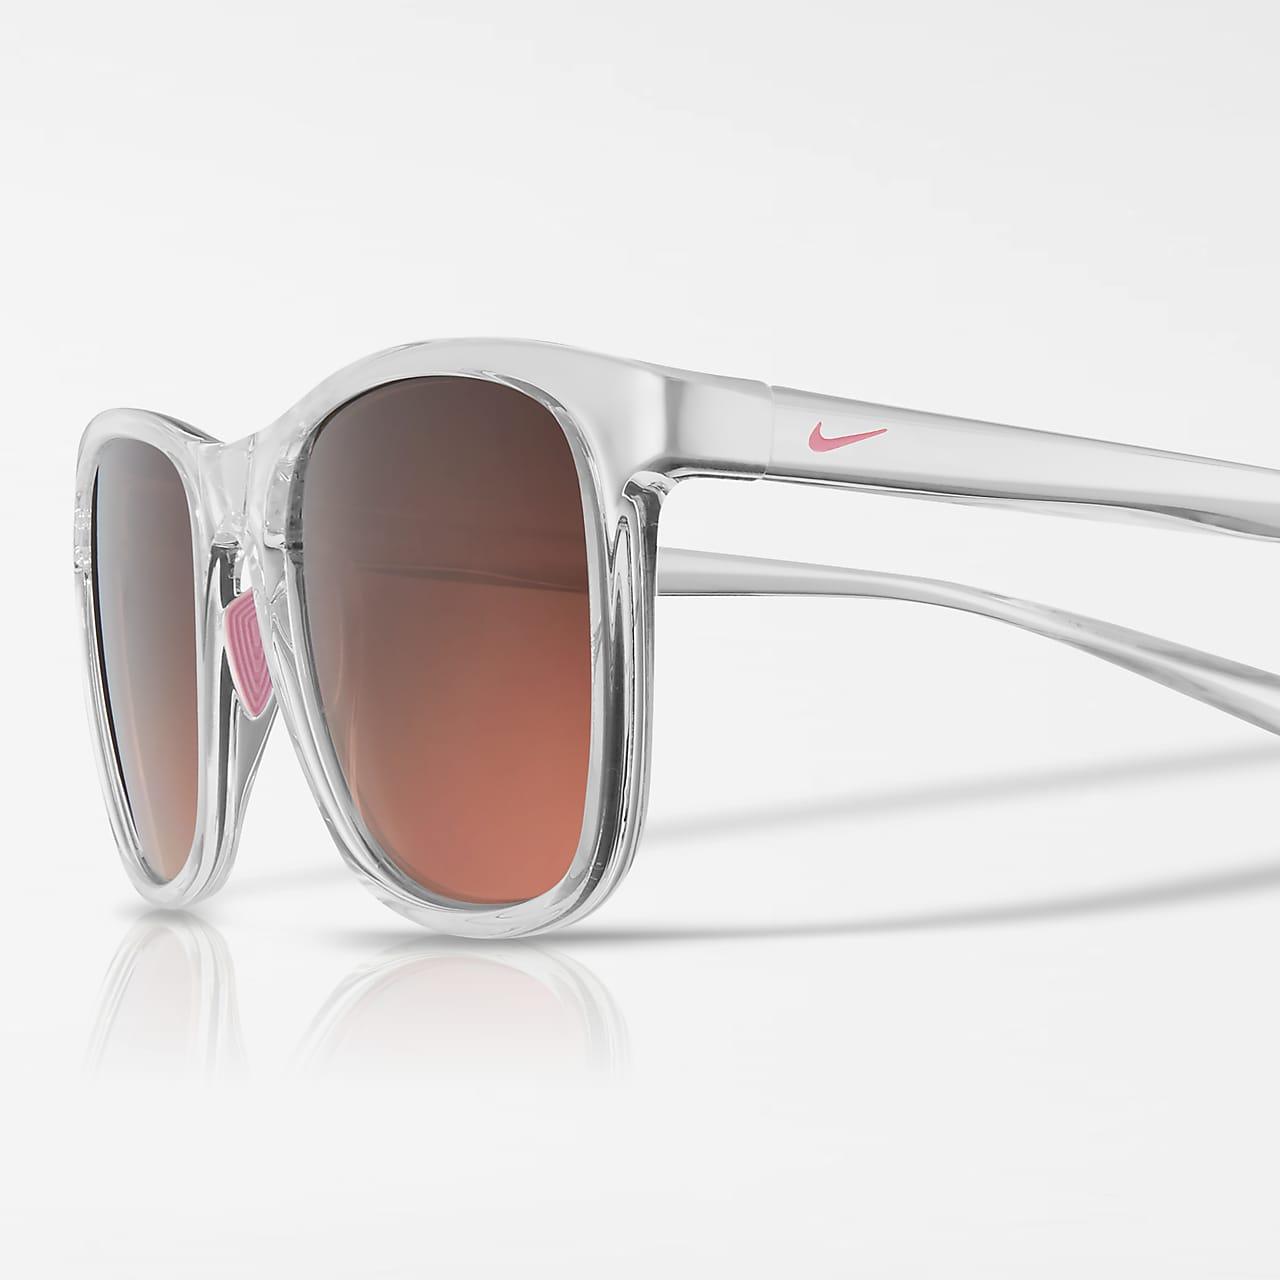 Nike Passage Sunglasses